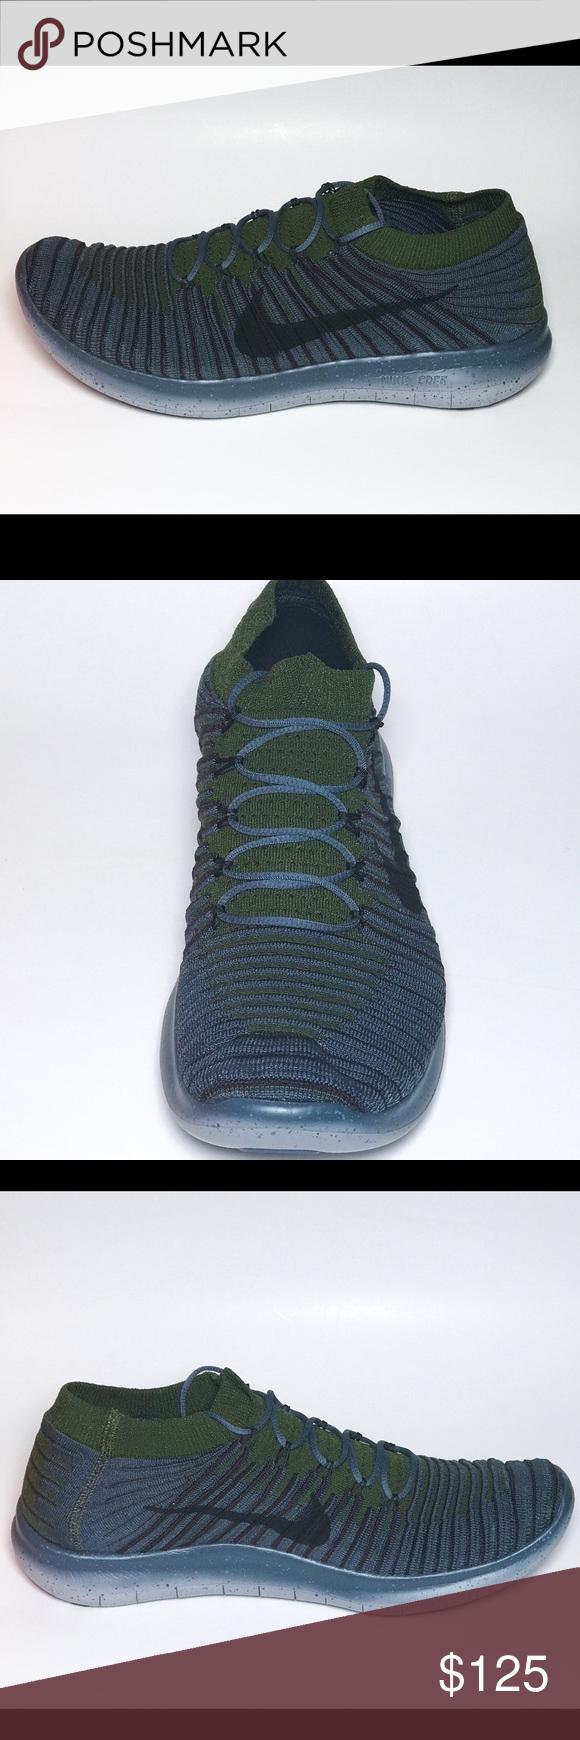 c54facc0f5ed Nike Free RN Motion Flyknit Running 834584-403 Nike Free RN Motion Flyknit  Blue Fox